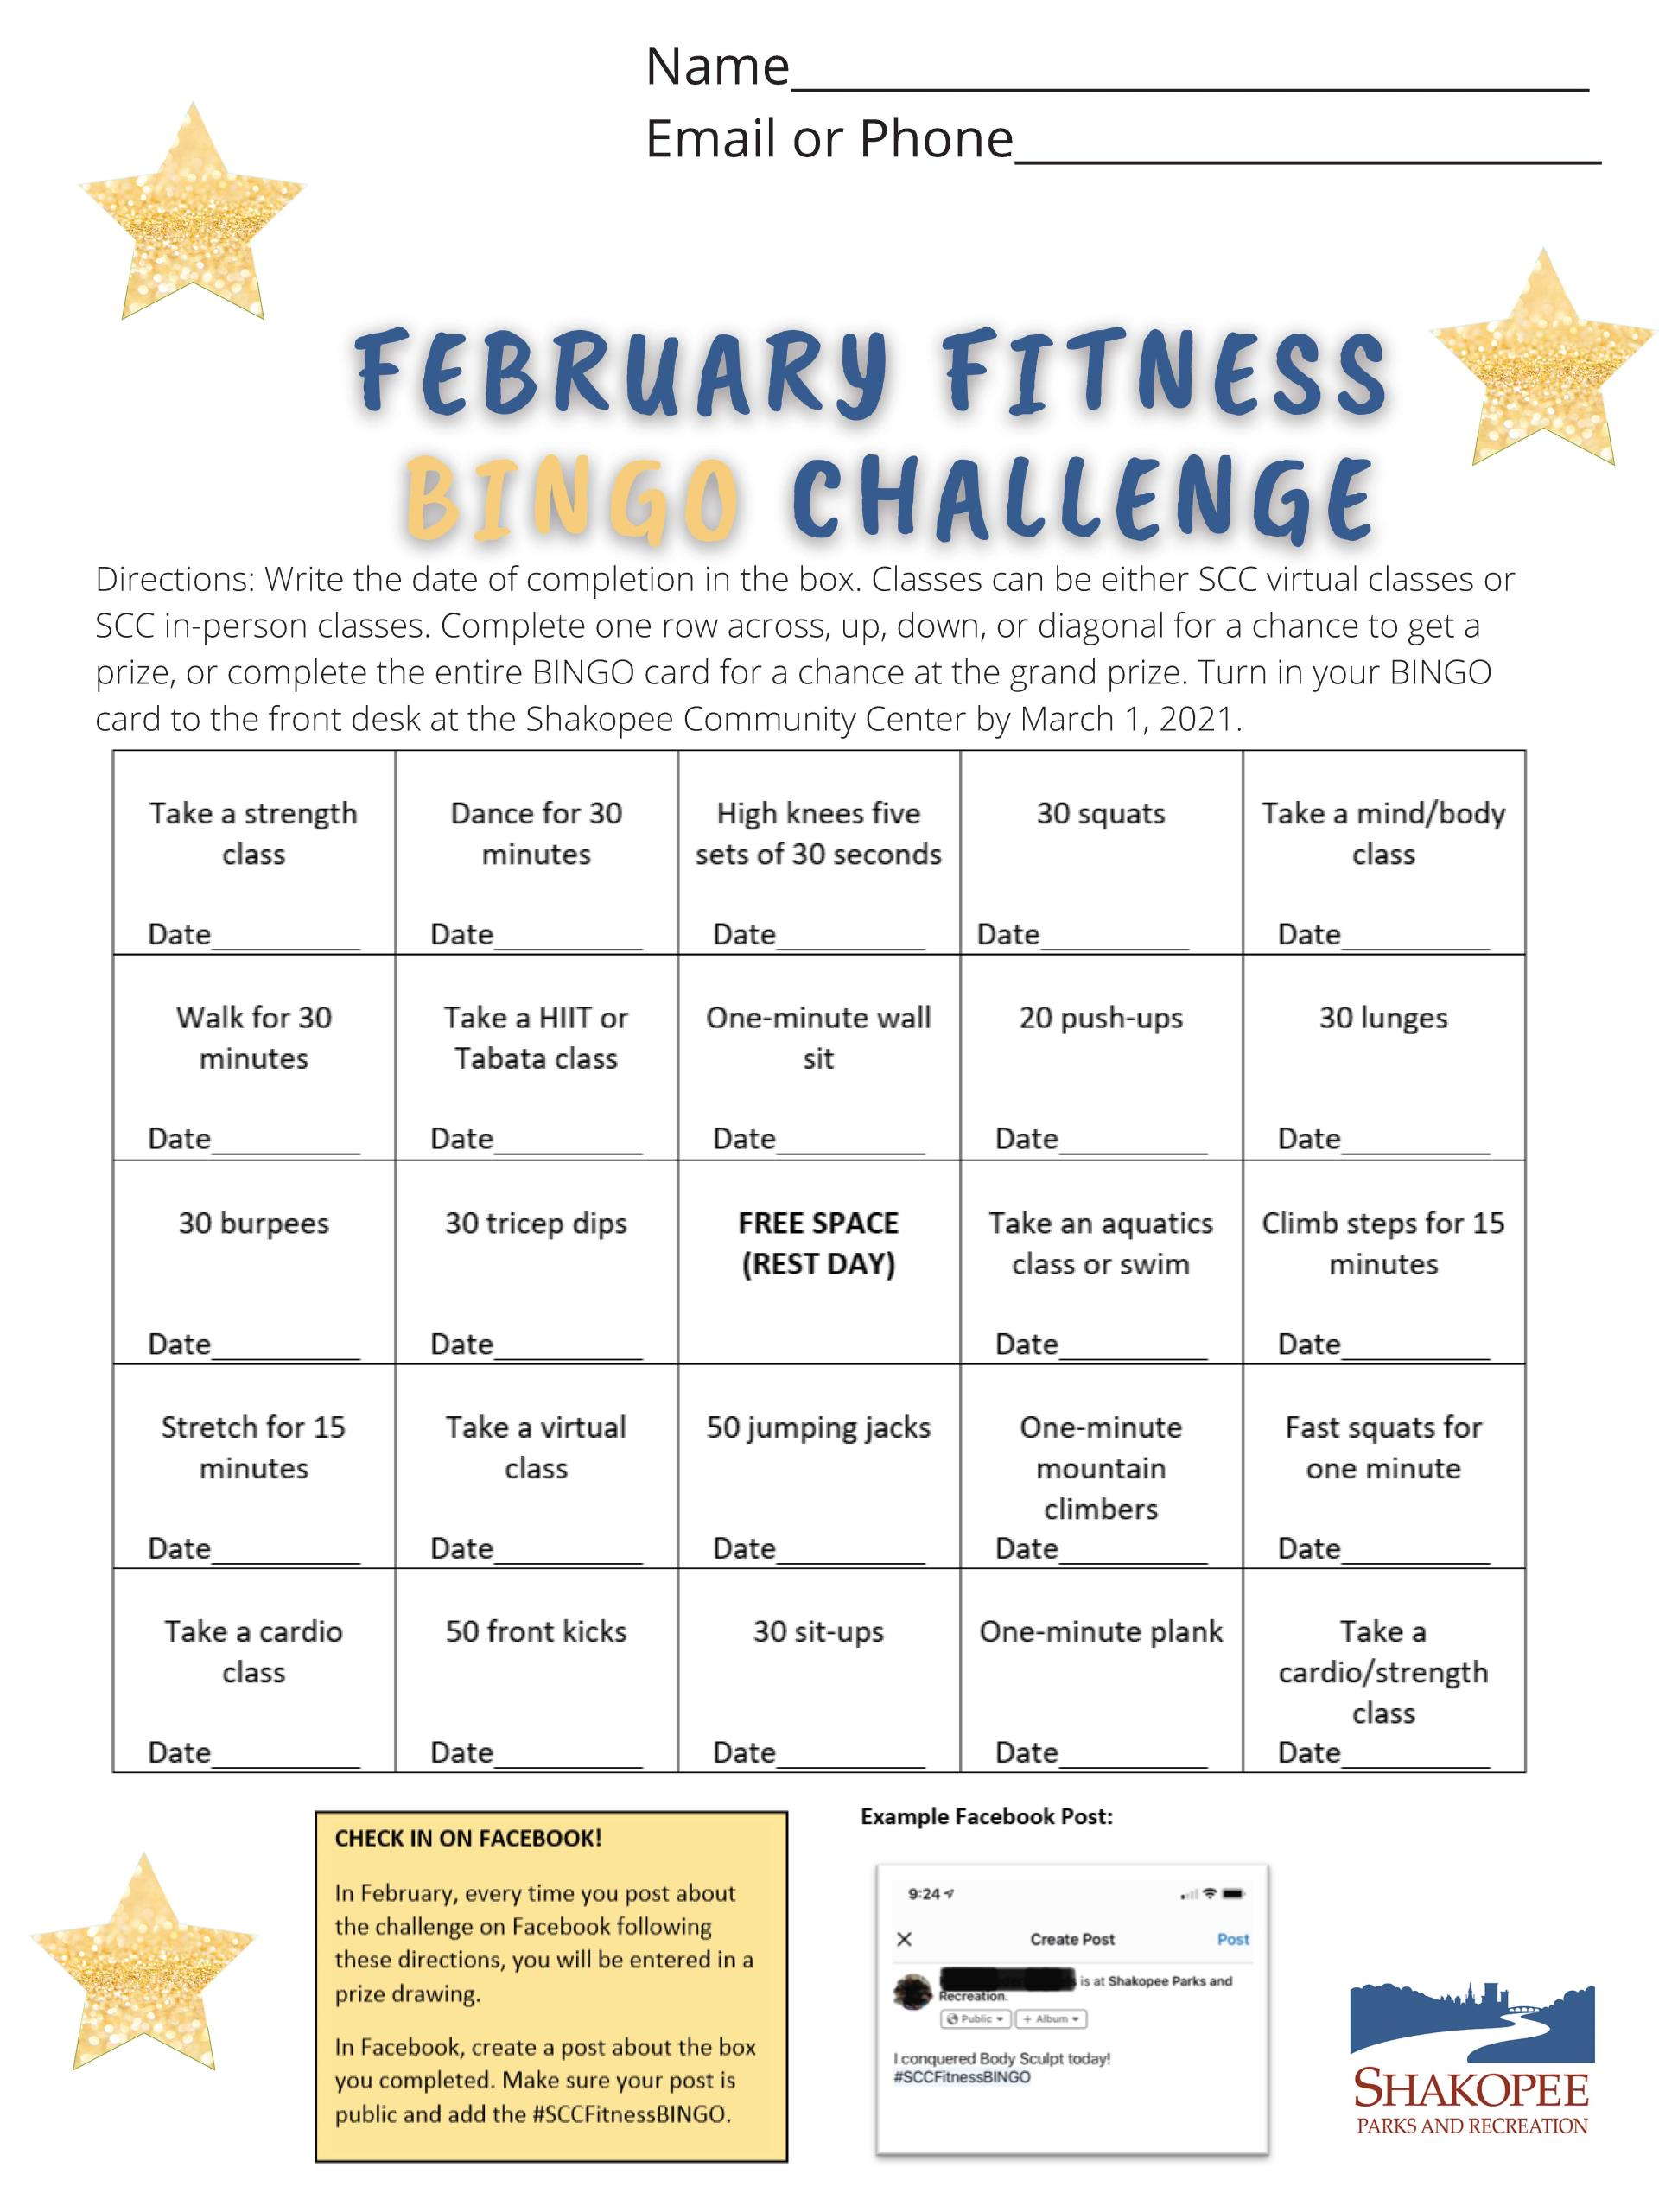 February Fitness BINGO Challenge Card